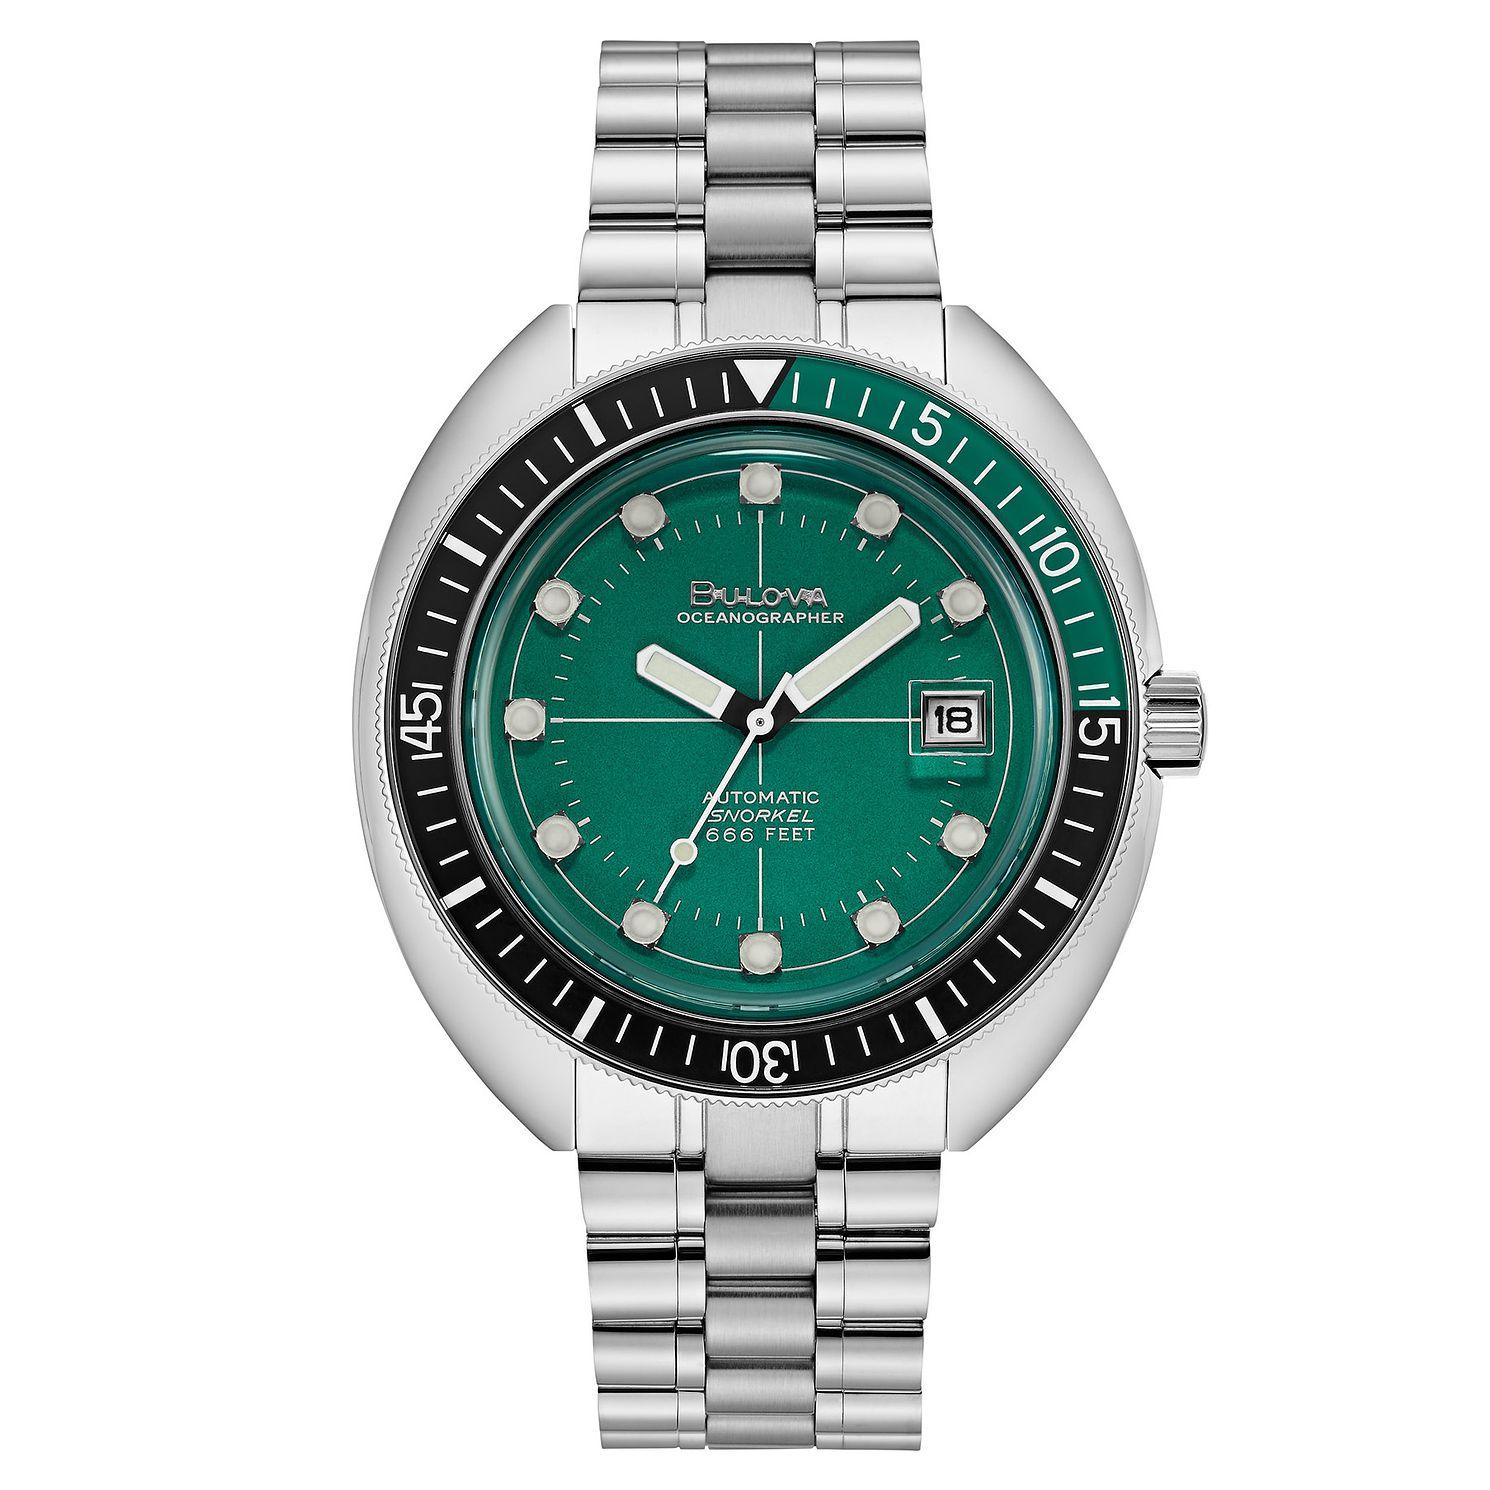 Bulova Oceanographer Men's Stainless Steel Bracelet Watch - Product number 3396827